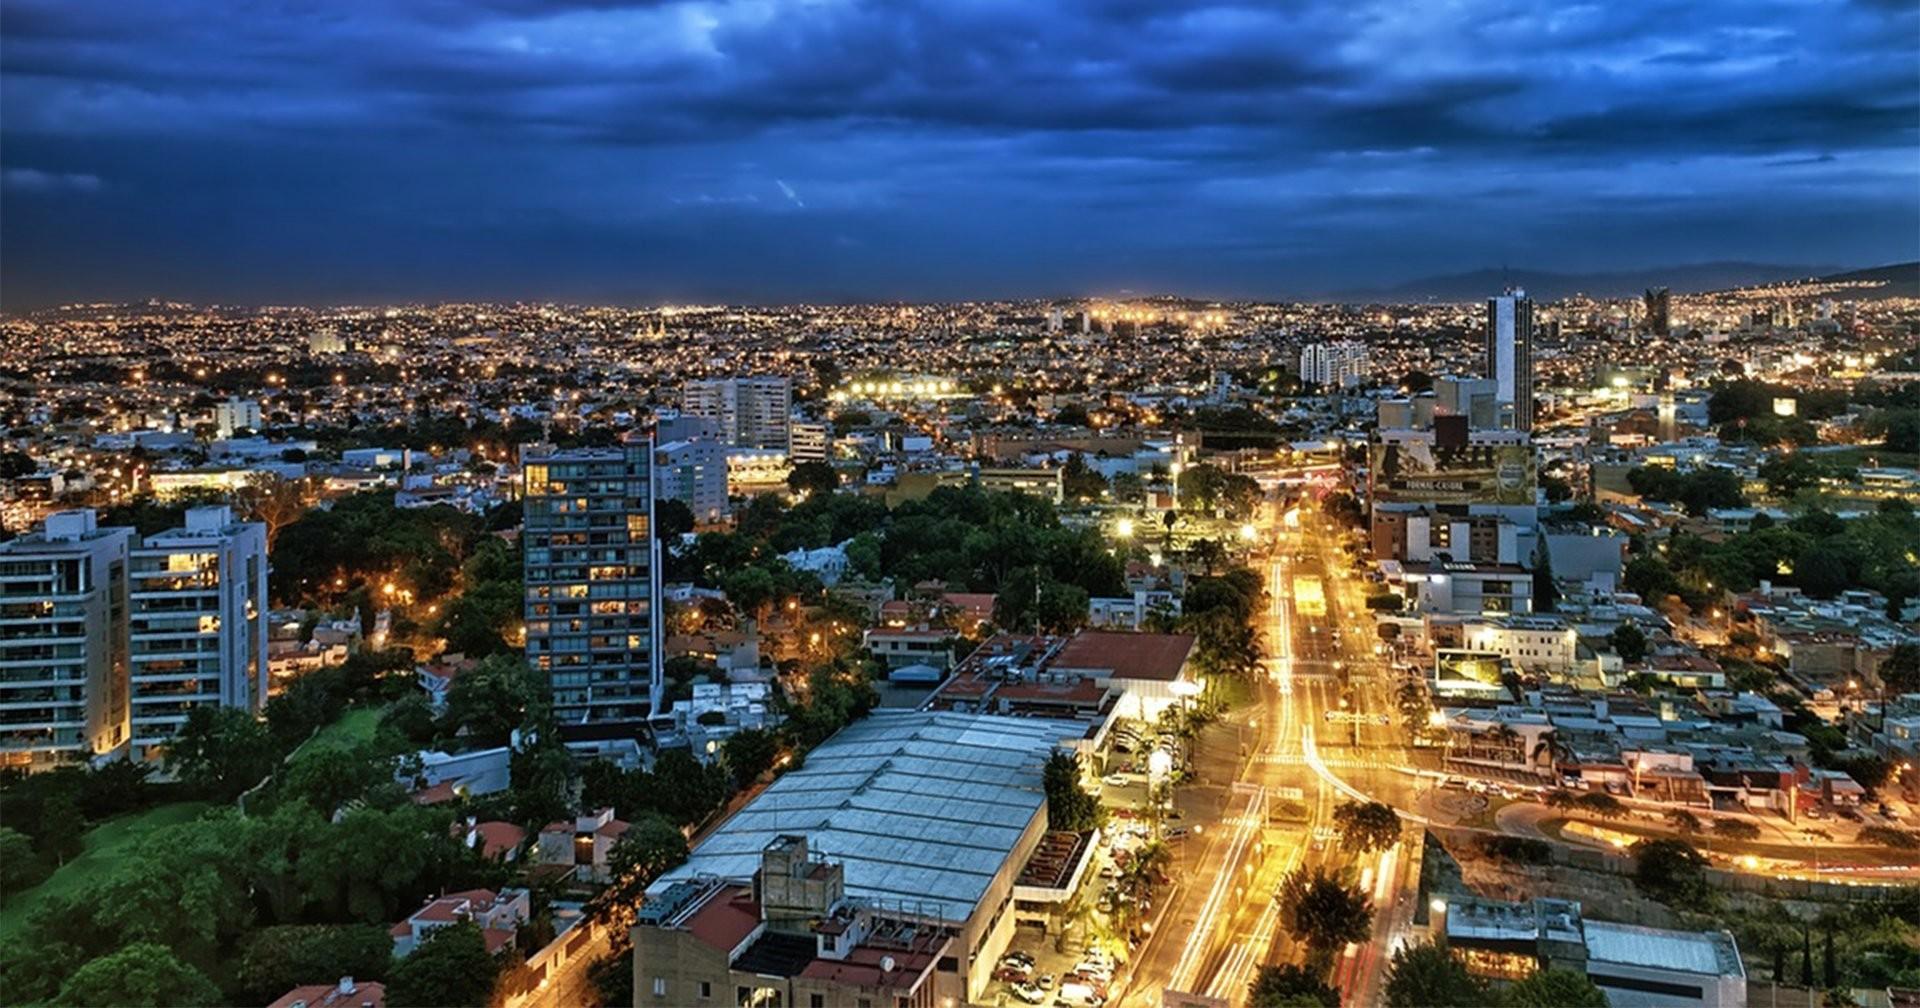 Esperienza a Guadalajara, Messico di Walter